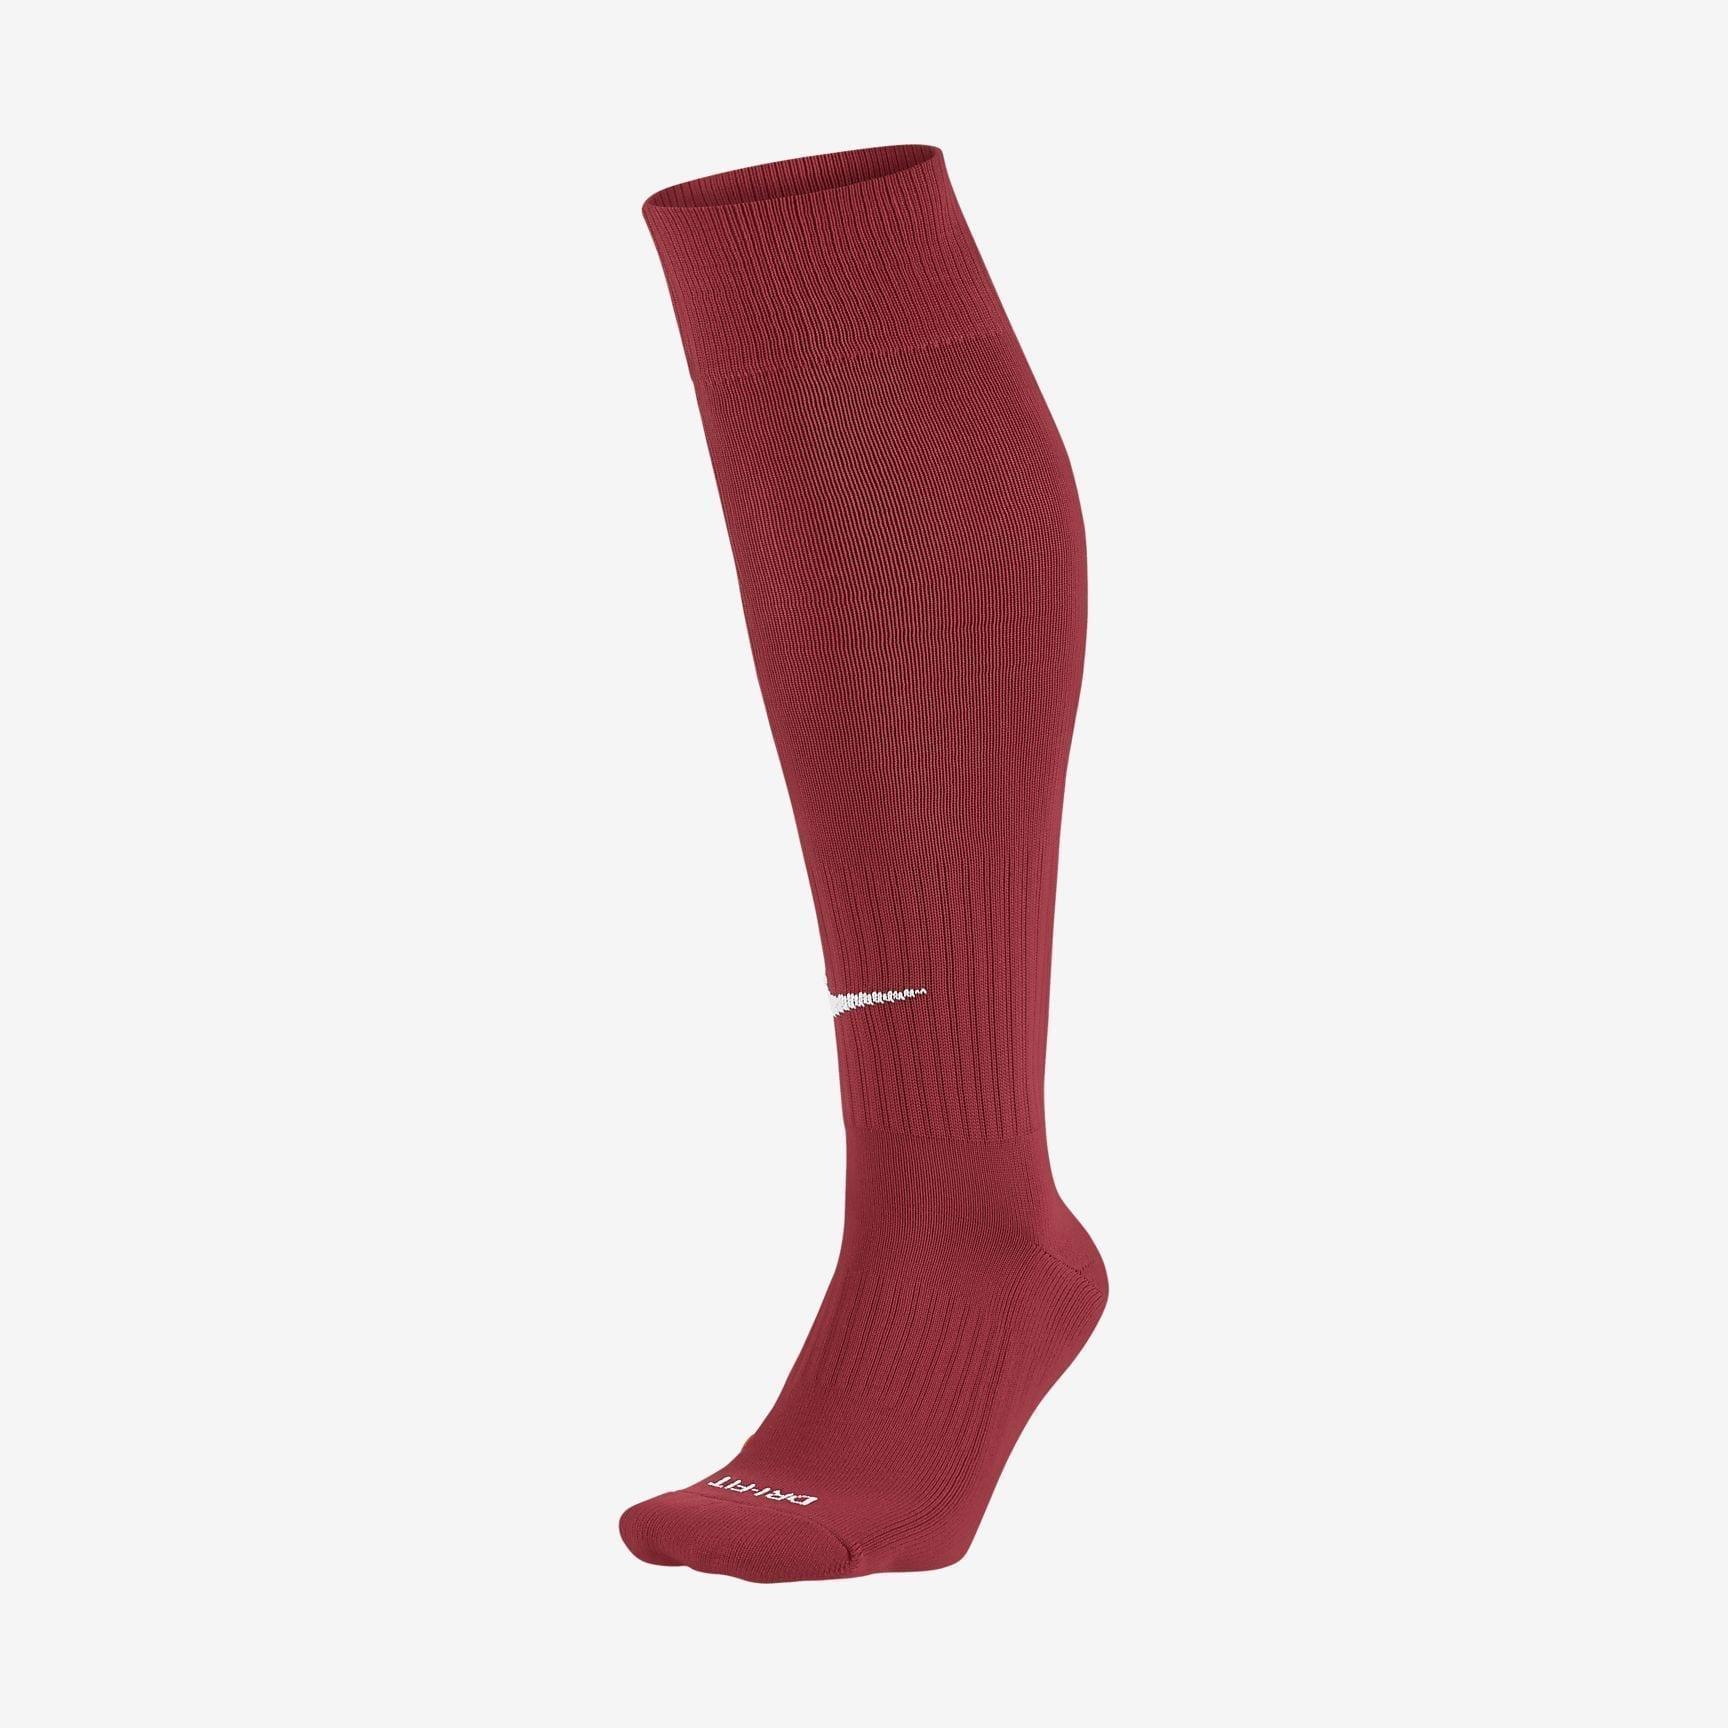 enniskillen rangers yth socks 31702 p